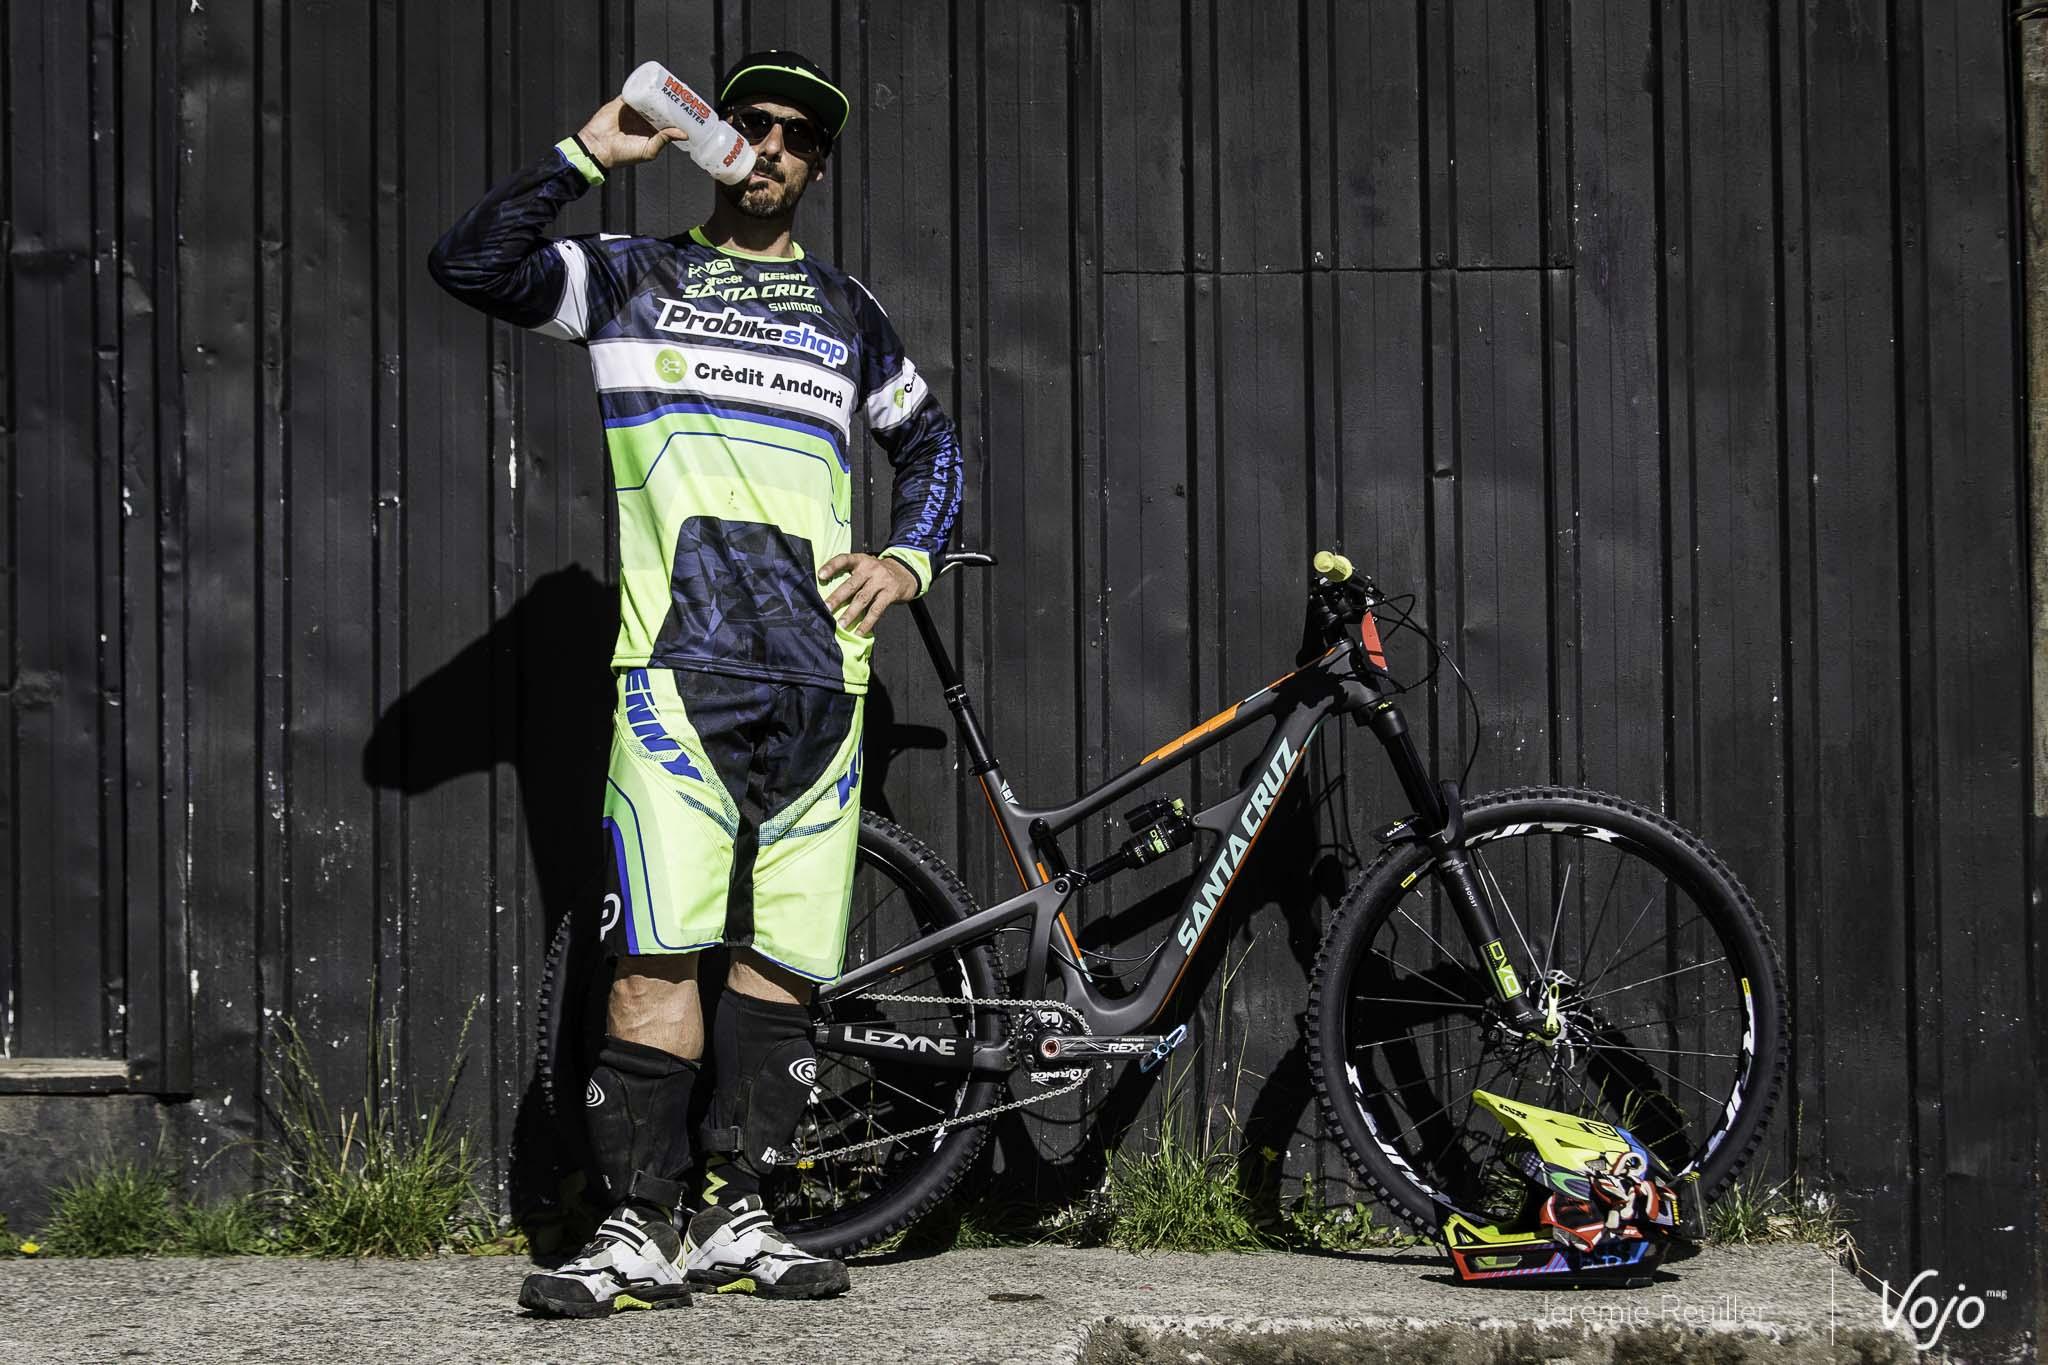 Bike_Check_EWS_Cedric_Gracia_Copyright_Reuiller_Vojomag-1